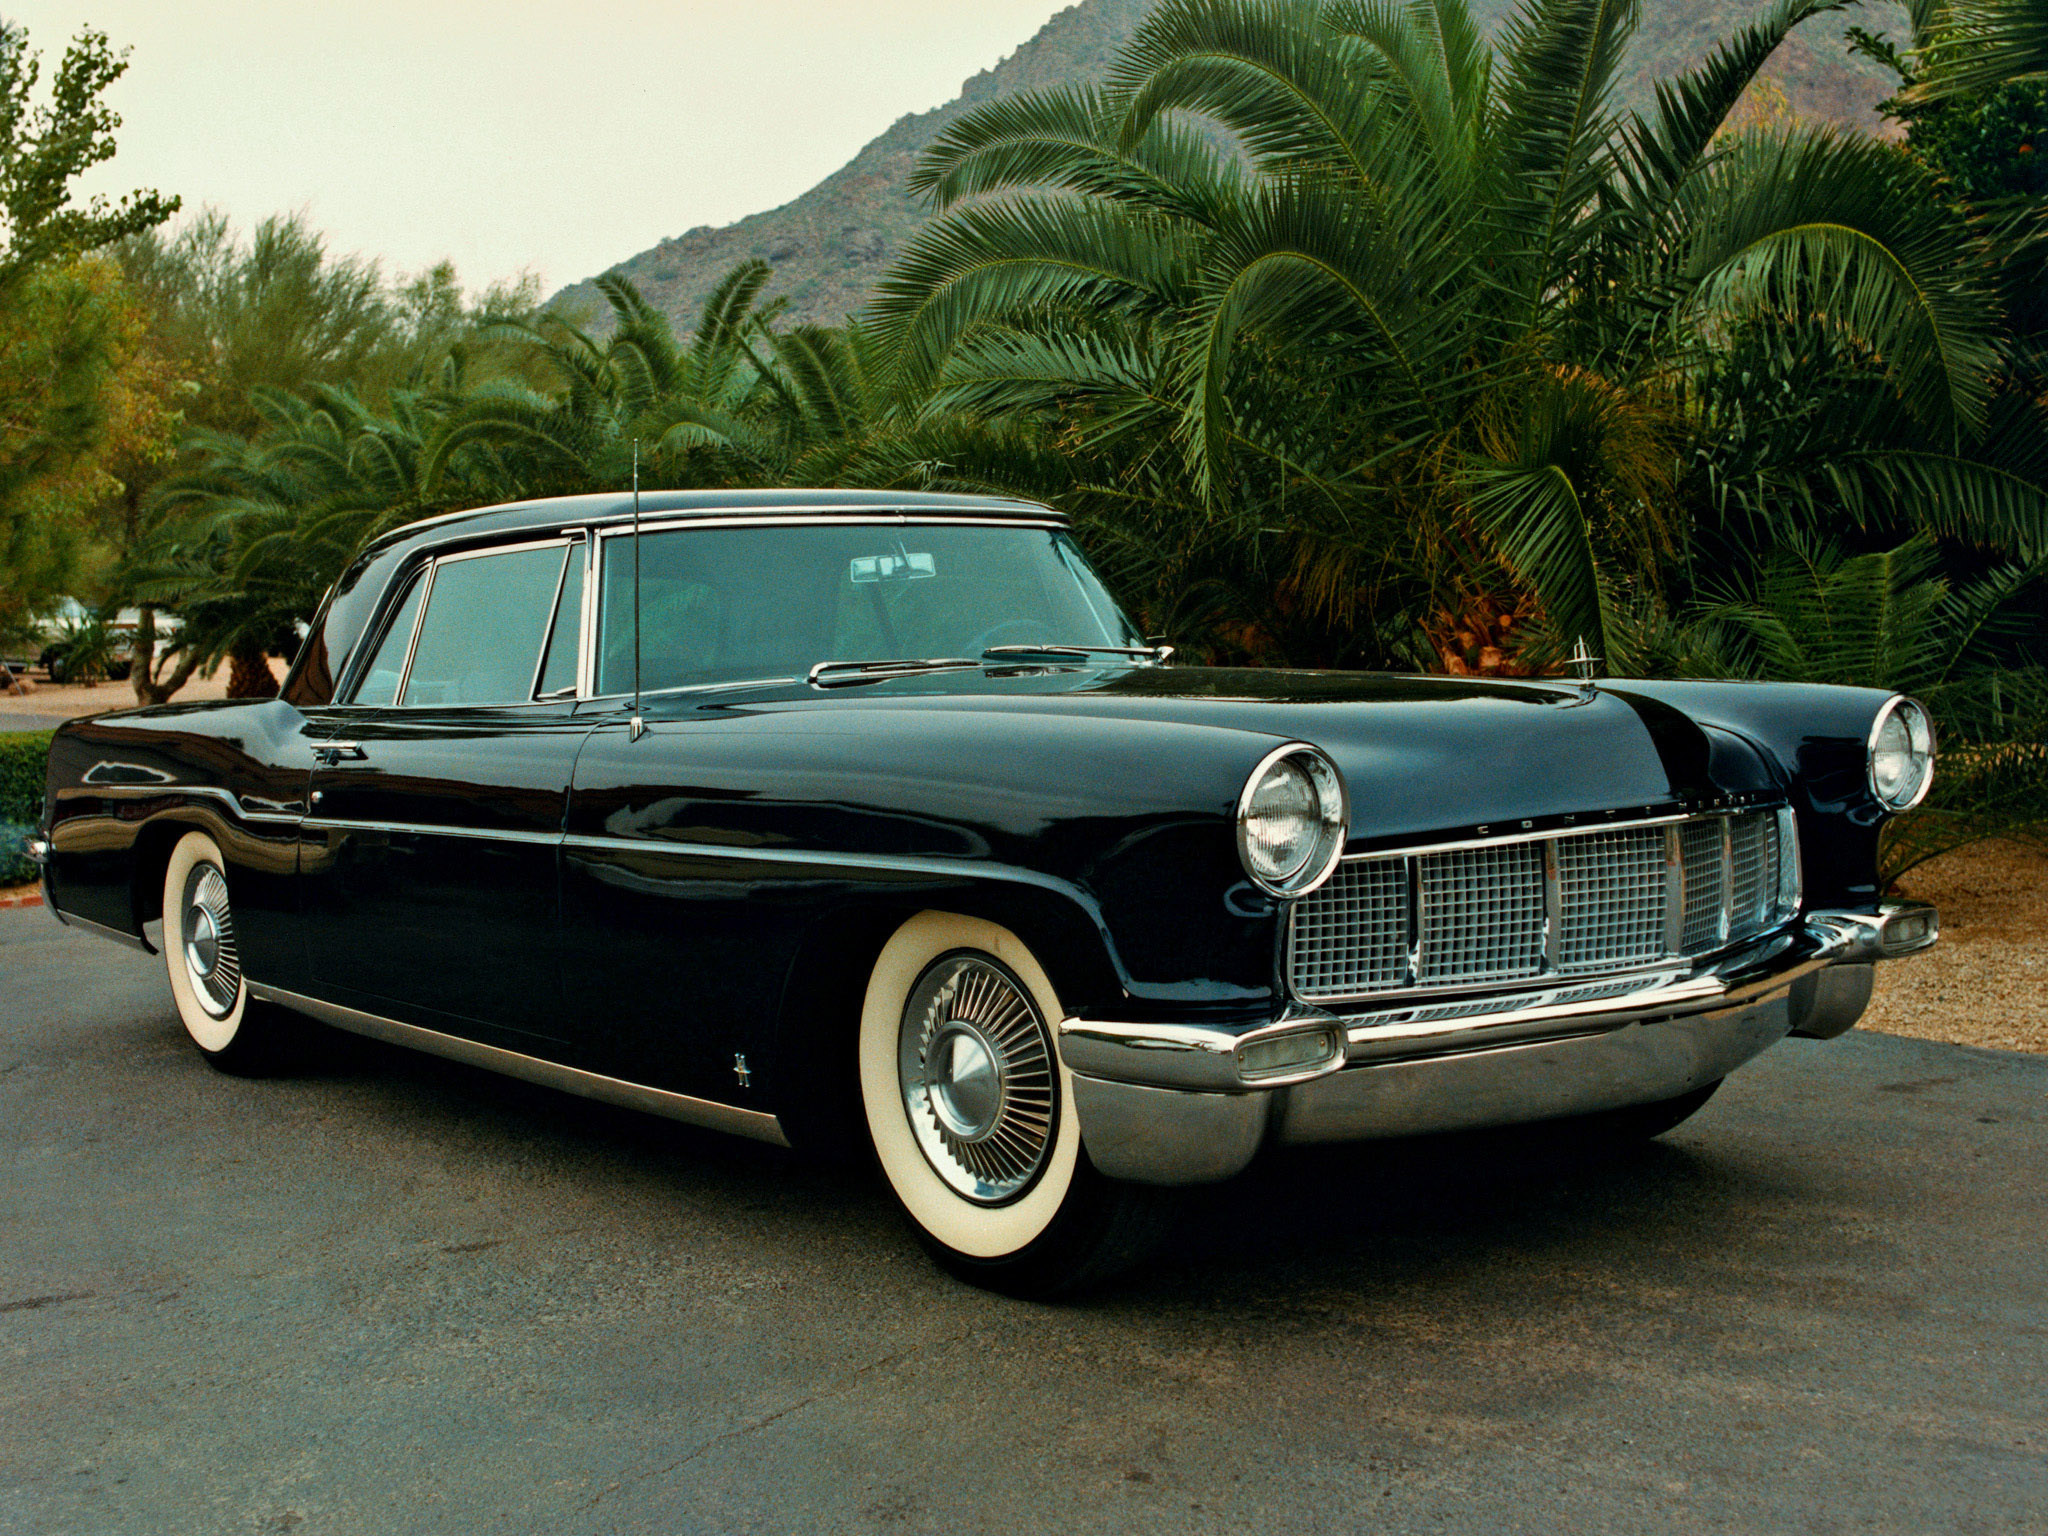 Lincoln Town Car For Sale Craigslist